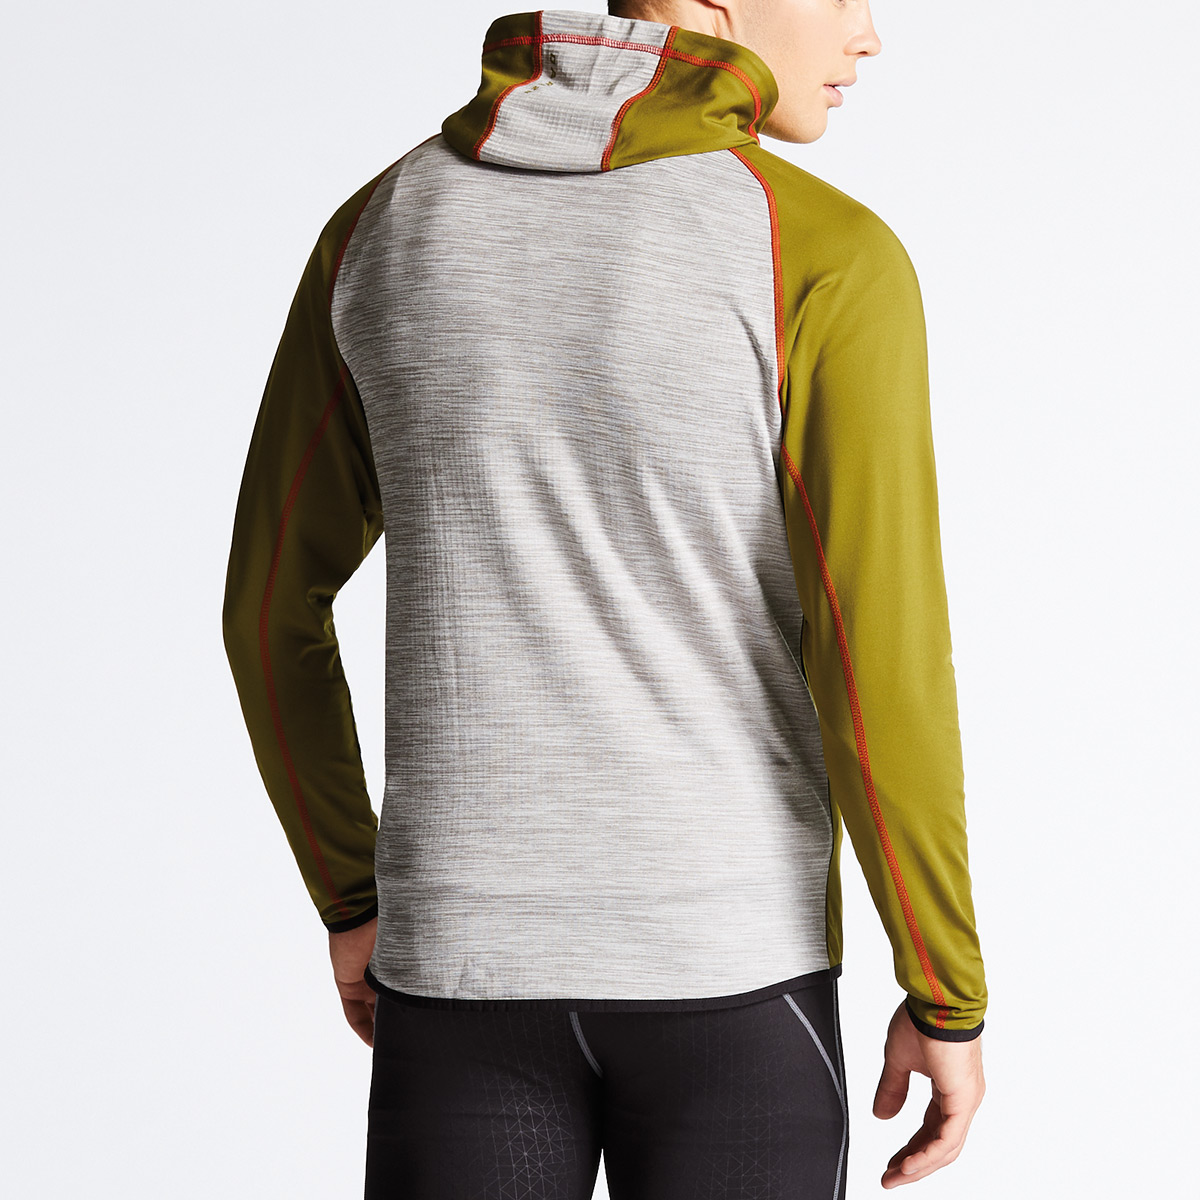 Dare 2b Mens Ratify II Core Stretch Hooded Zip Jacket Top 62/% OFF RRP